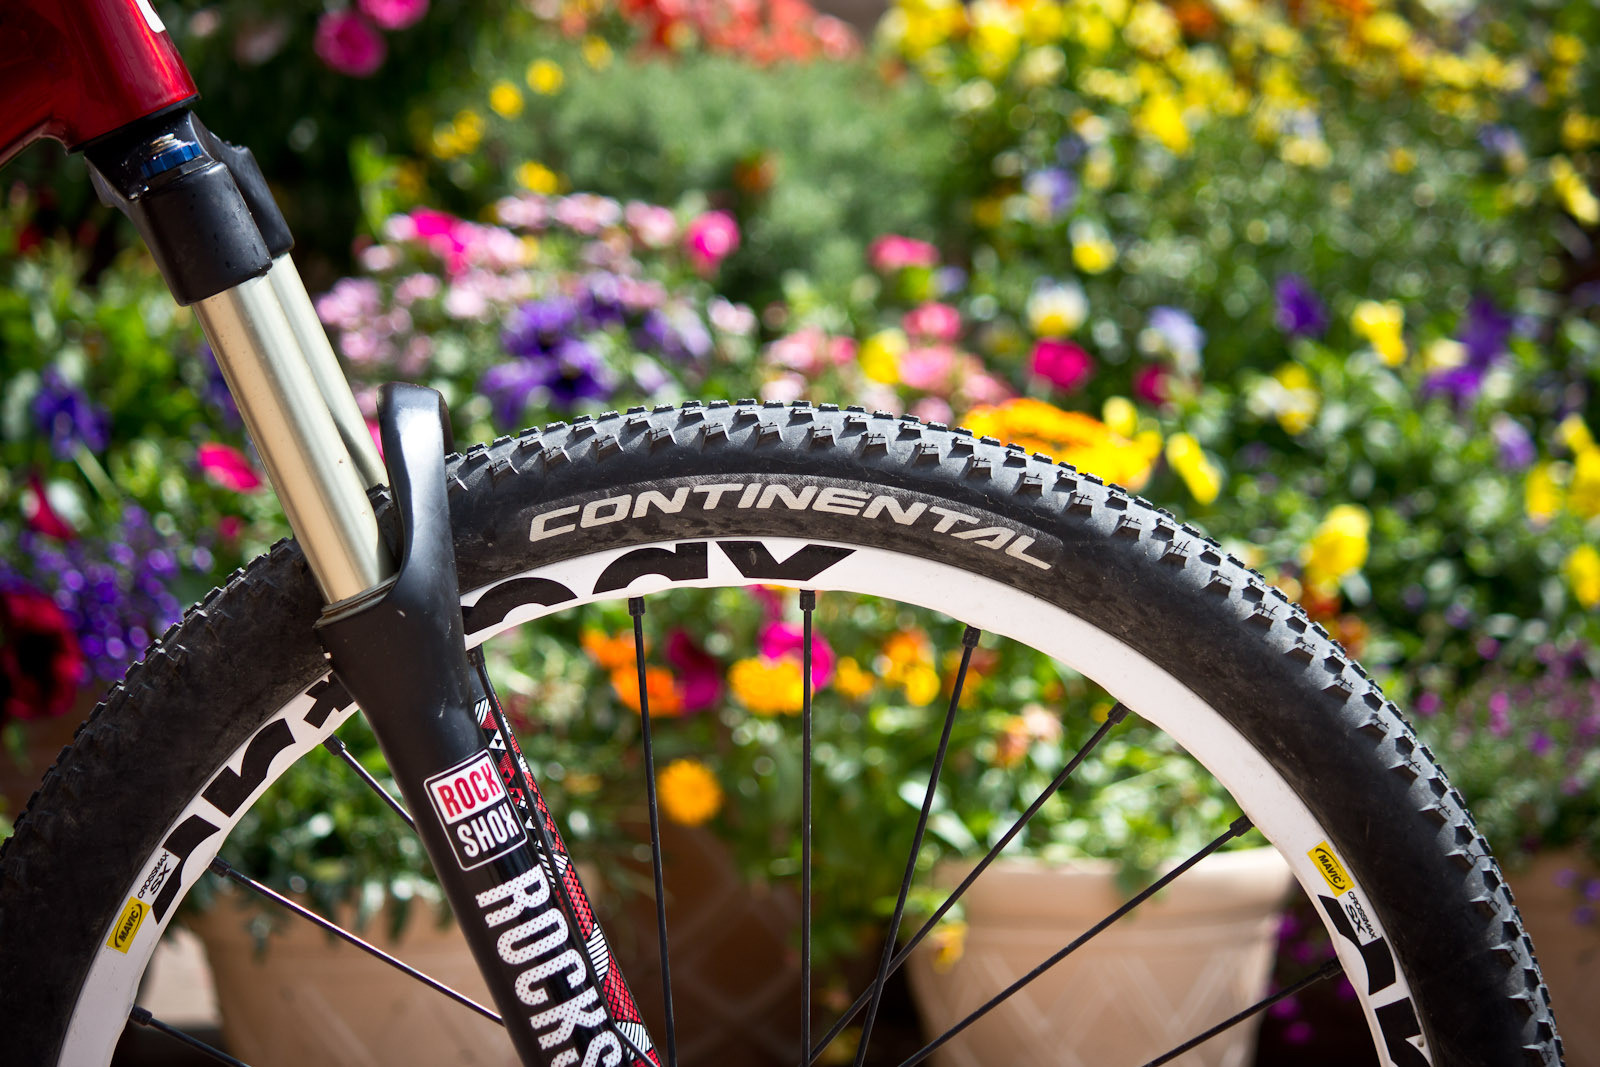 RockShox Argyle Fork - Winning Bike: Martin Söderström's Specialized P.Slope - Mountain Biking Pictures - Vital MTB